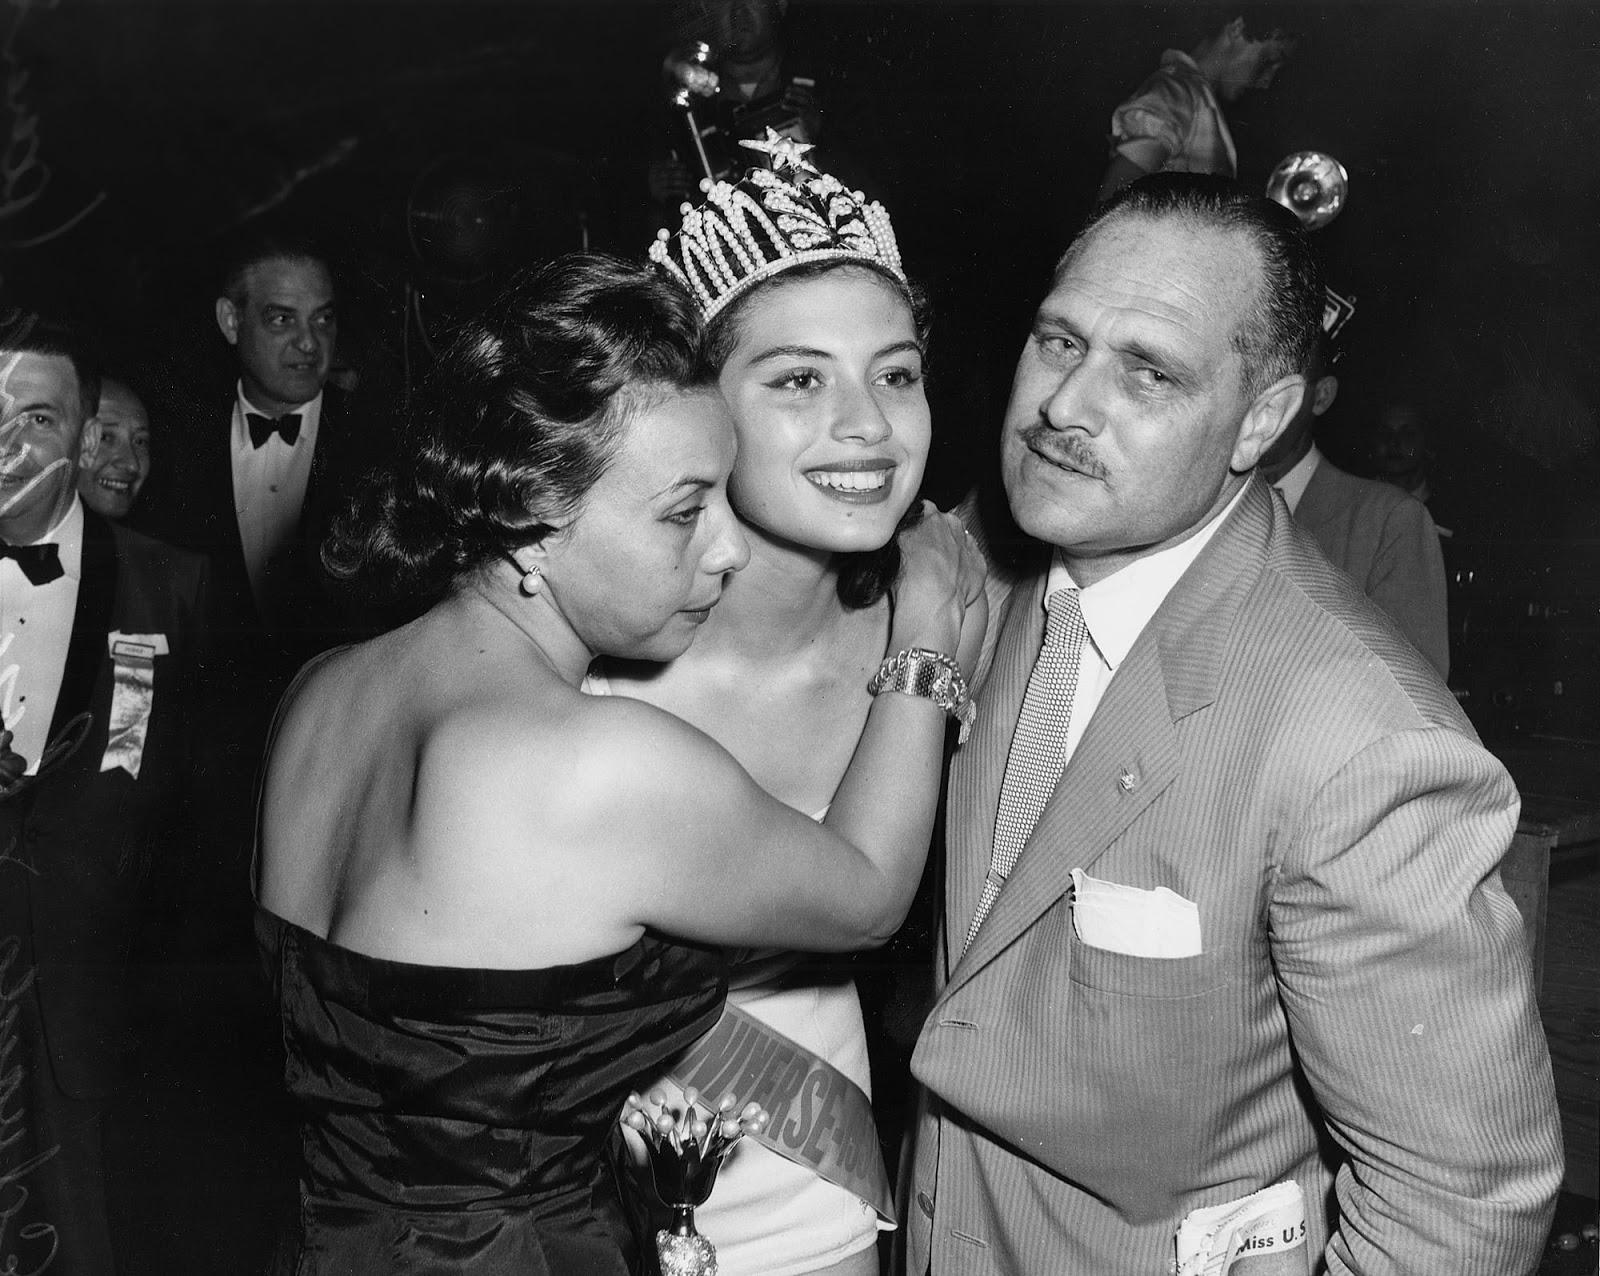 gladys zender, miss universe 1957. primera latina a vencer este concurso. Uni19510